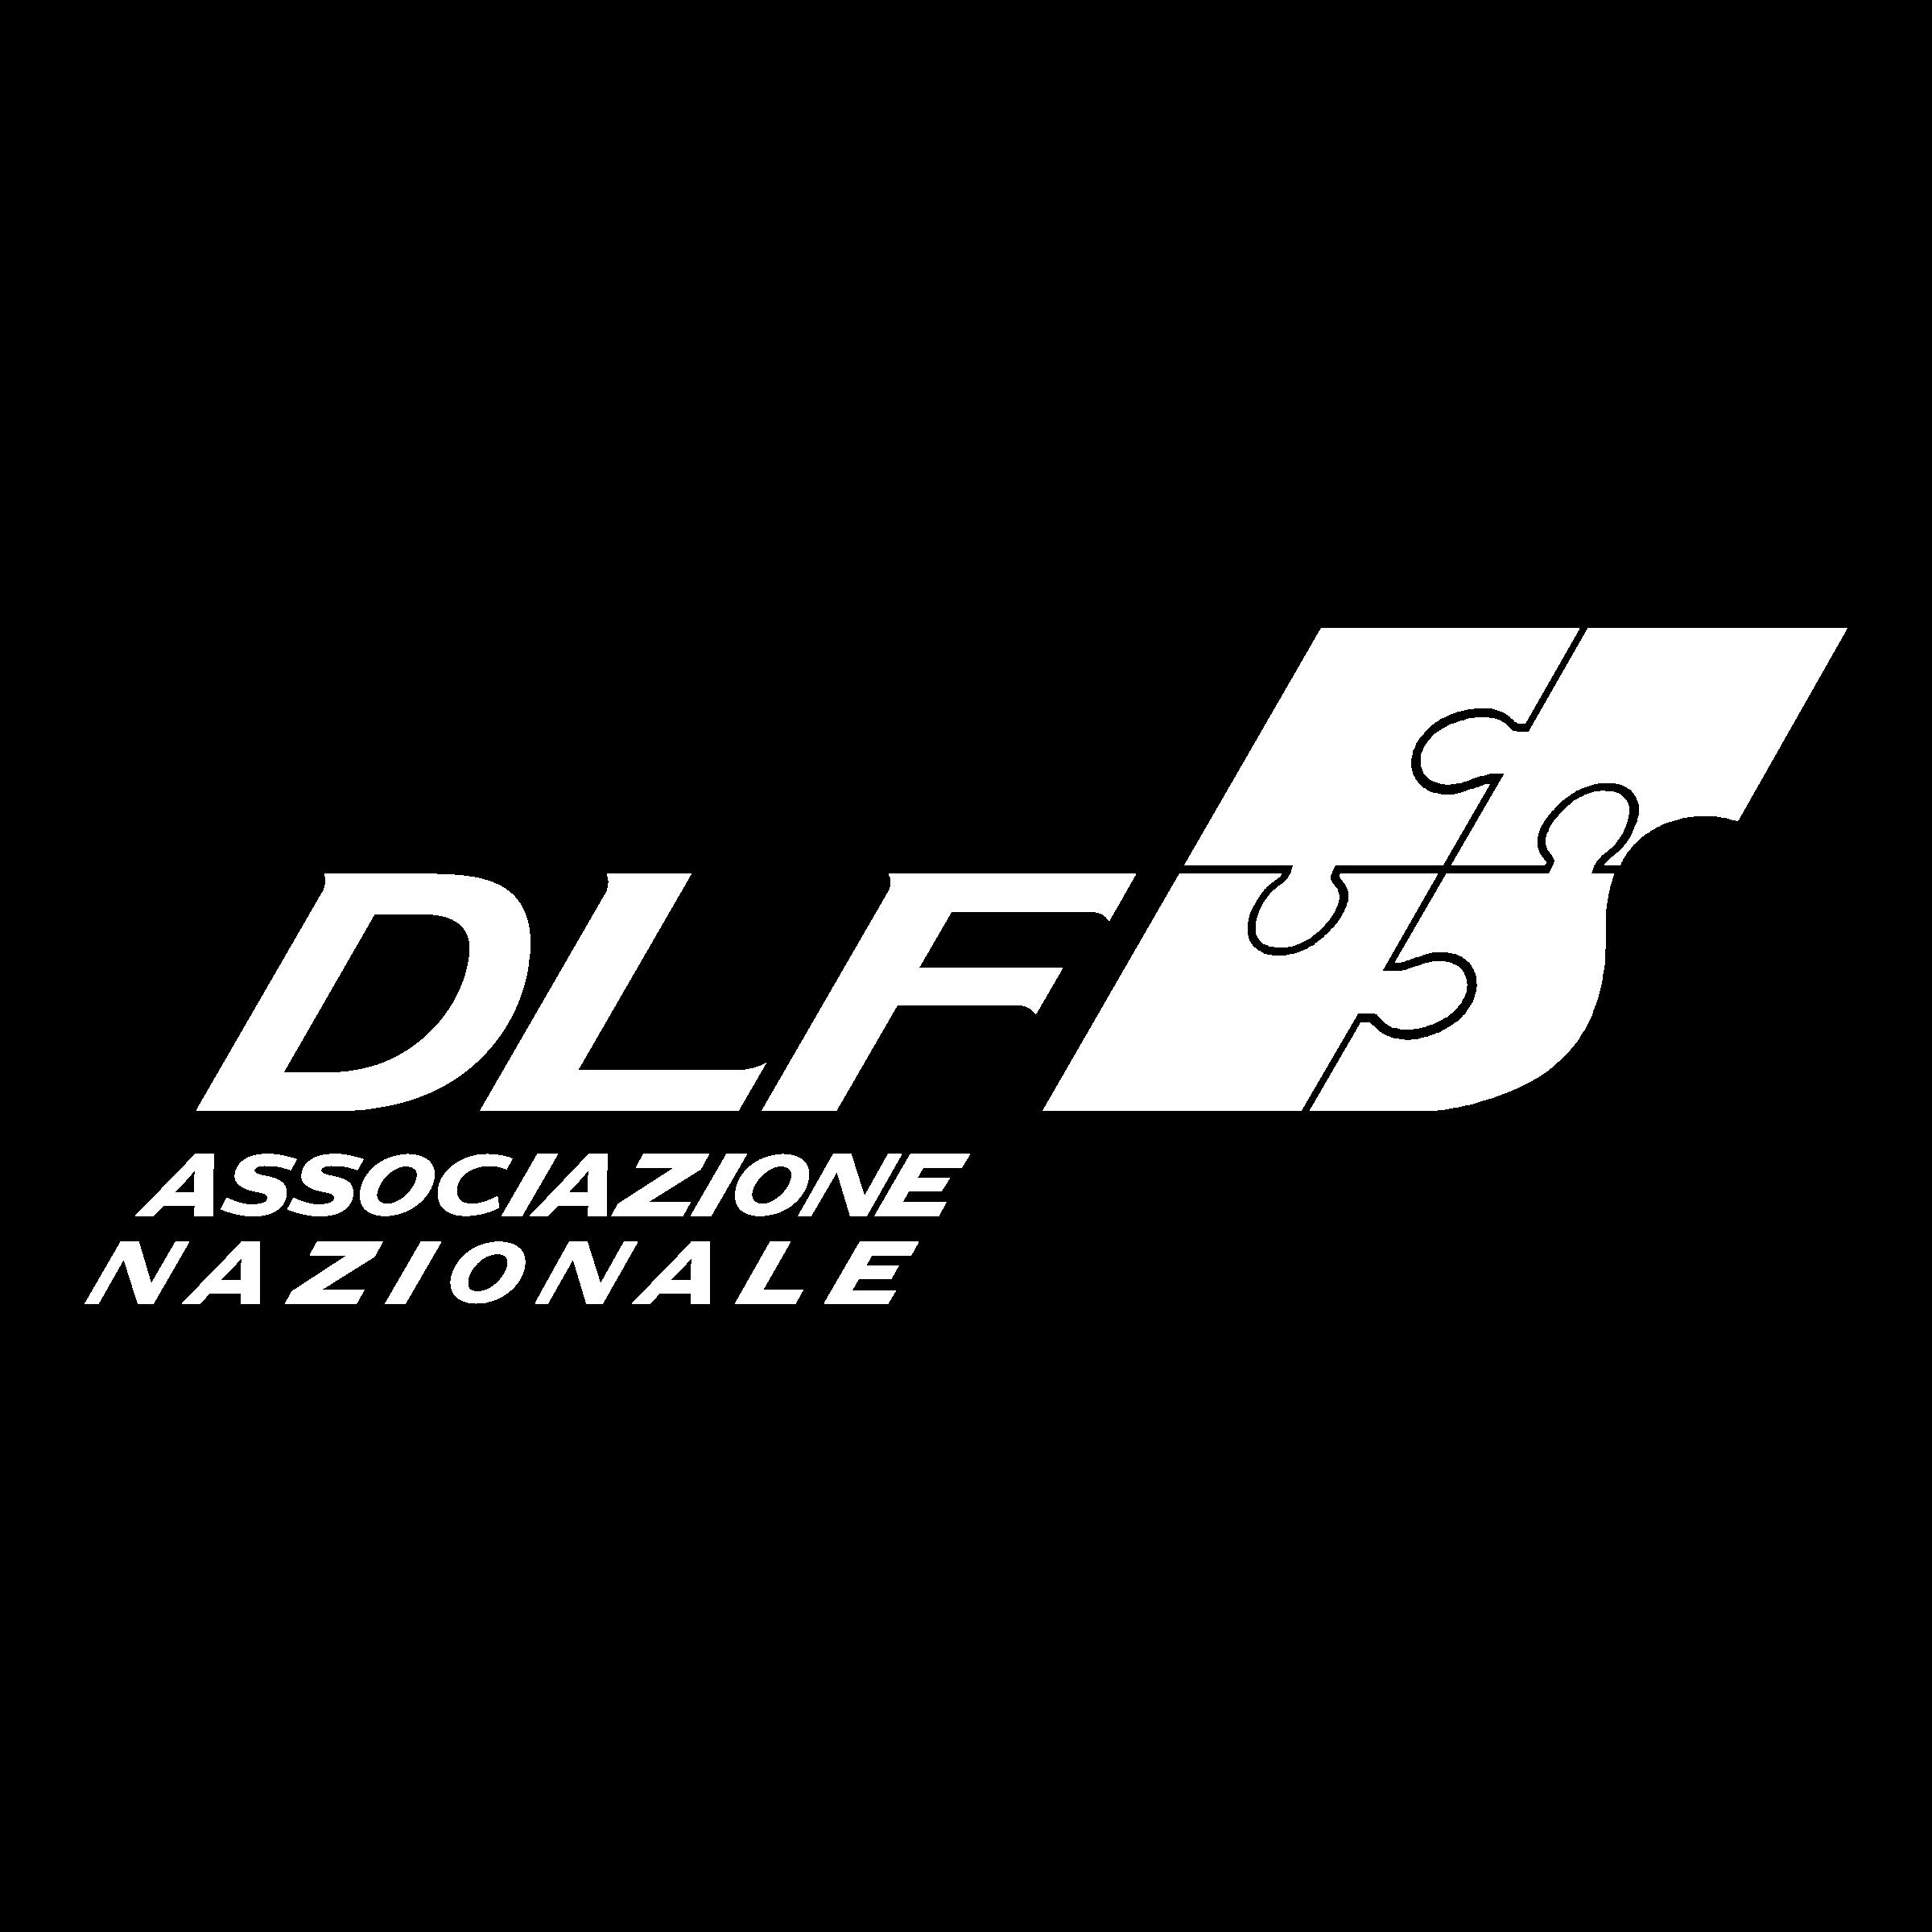 DLF Logo PNG Transparent & SVG Vector - Freebie Supply